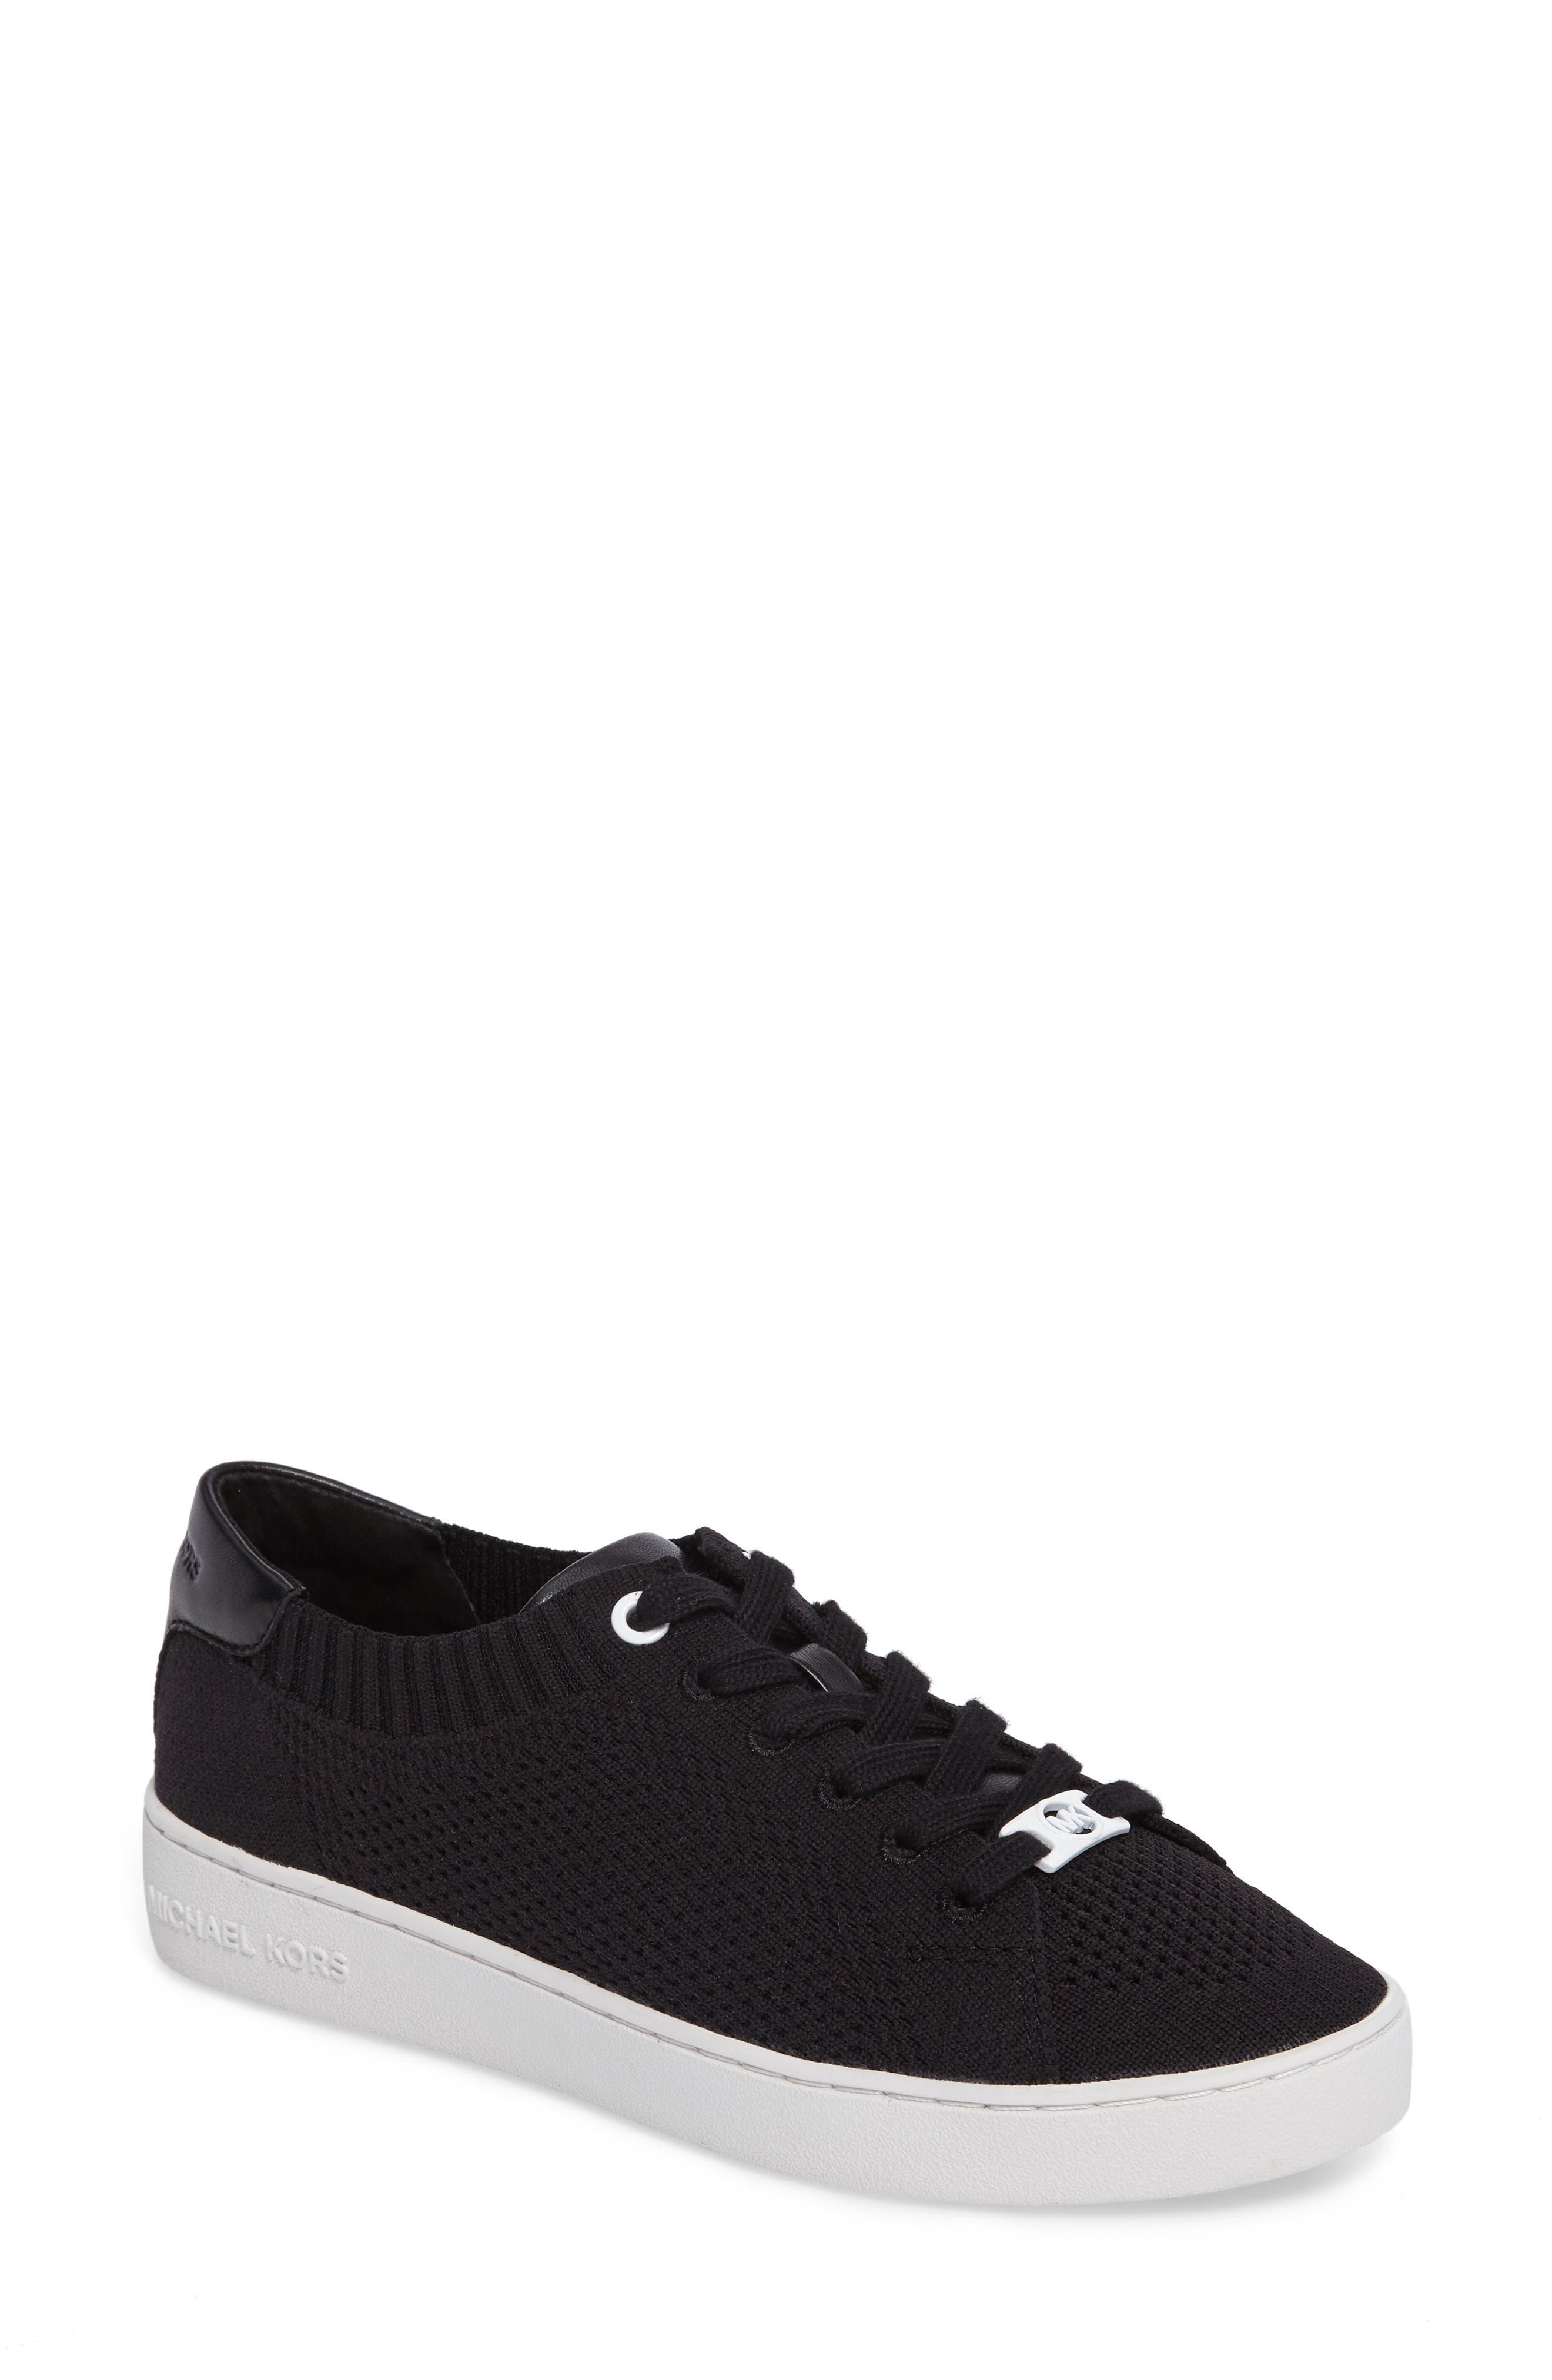 Skyler Knit Sneaker,                             Main thumbnail 1, color,                             001